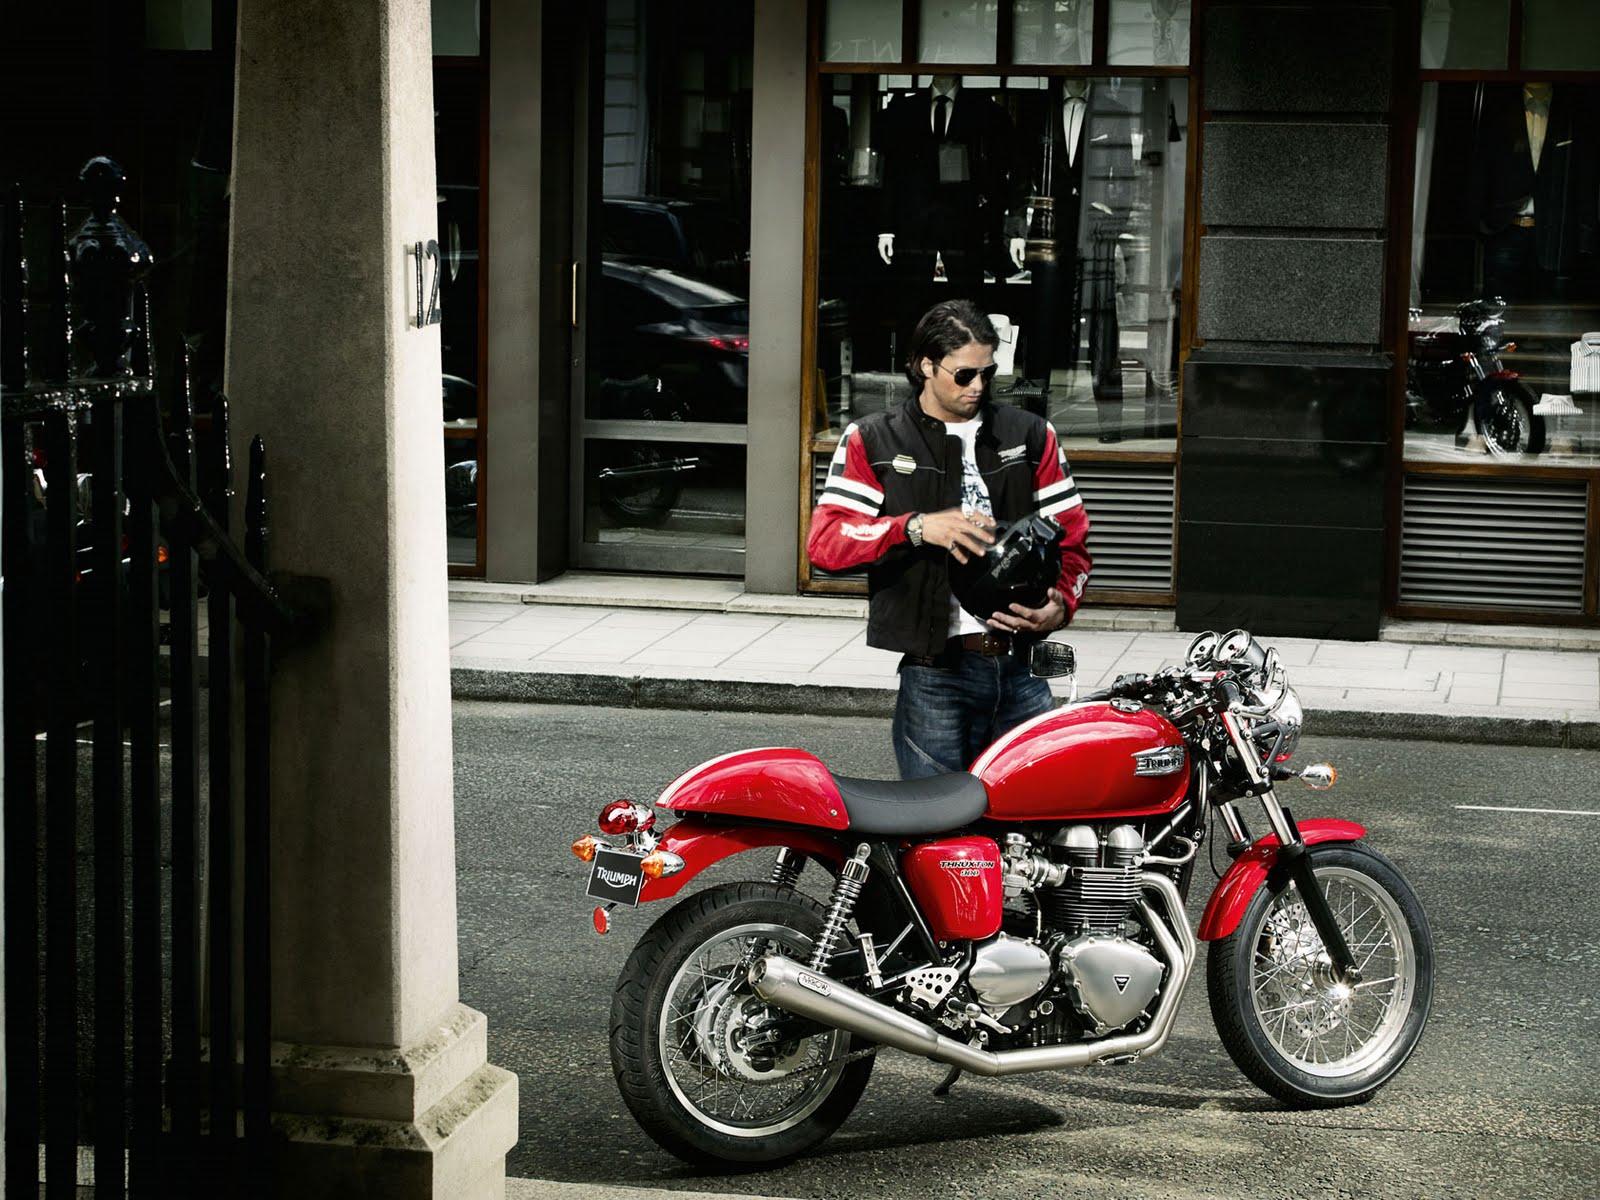 http://2.bp.blogspot.com/_YRPky_unmWw/S7nyqgncy_I/AAAAAAAABco/vJKrQV1hDao/s1600/2010+Triumph+Thruxton+red.jpg